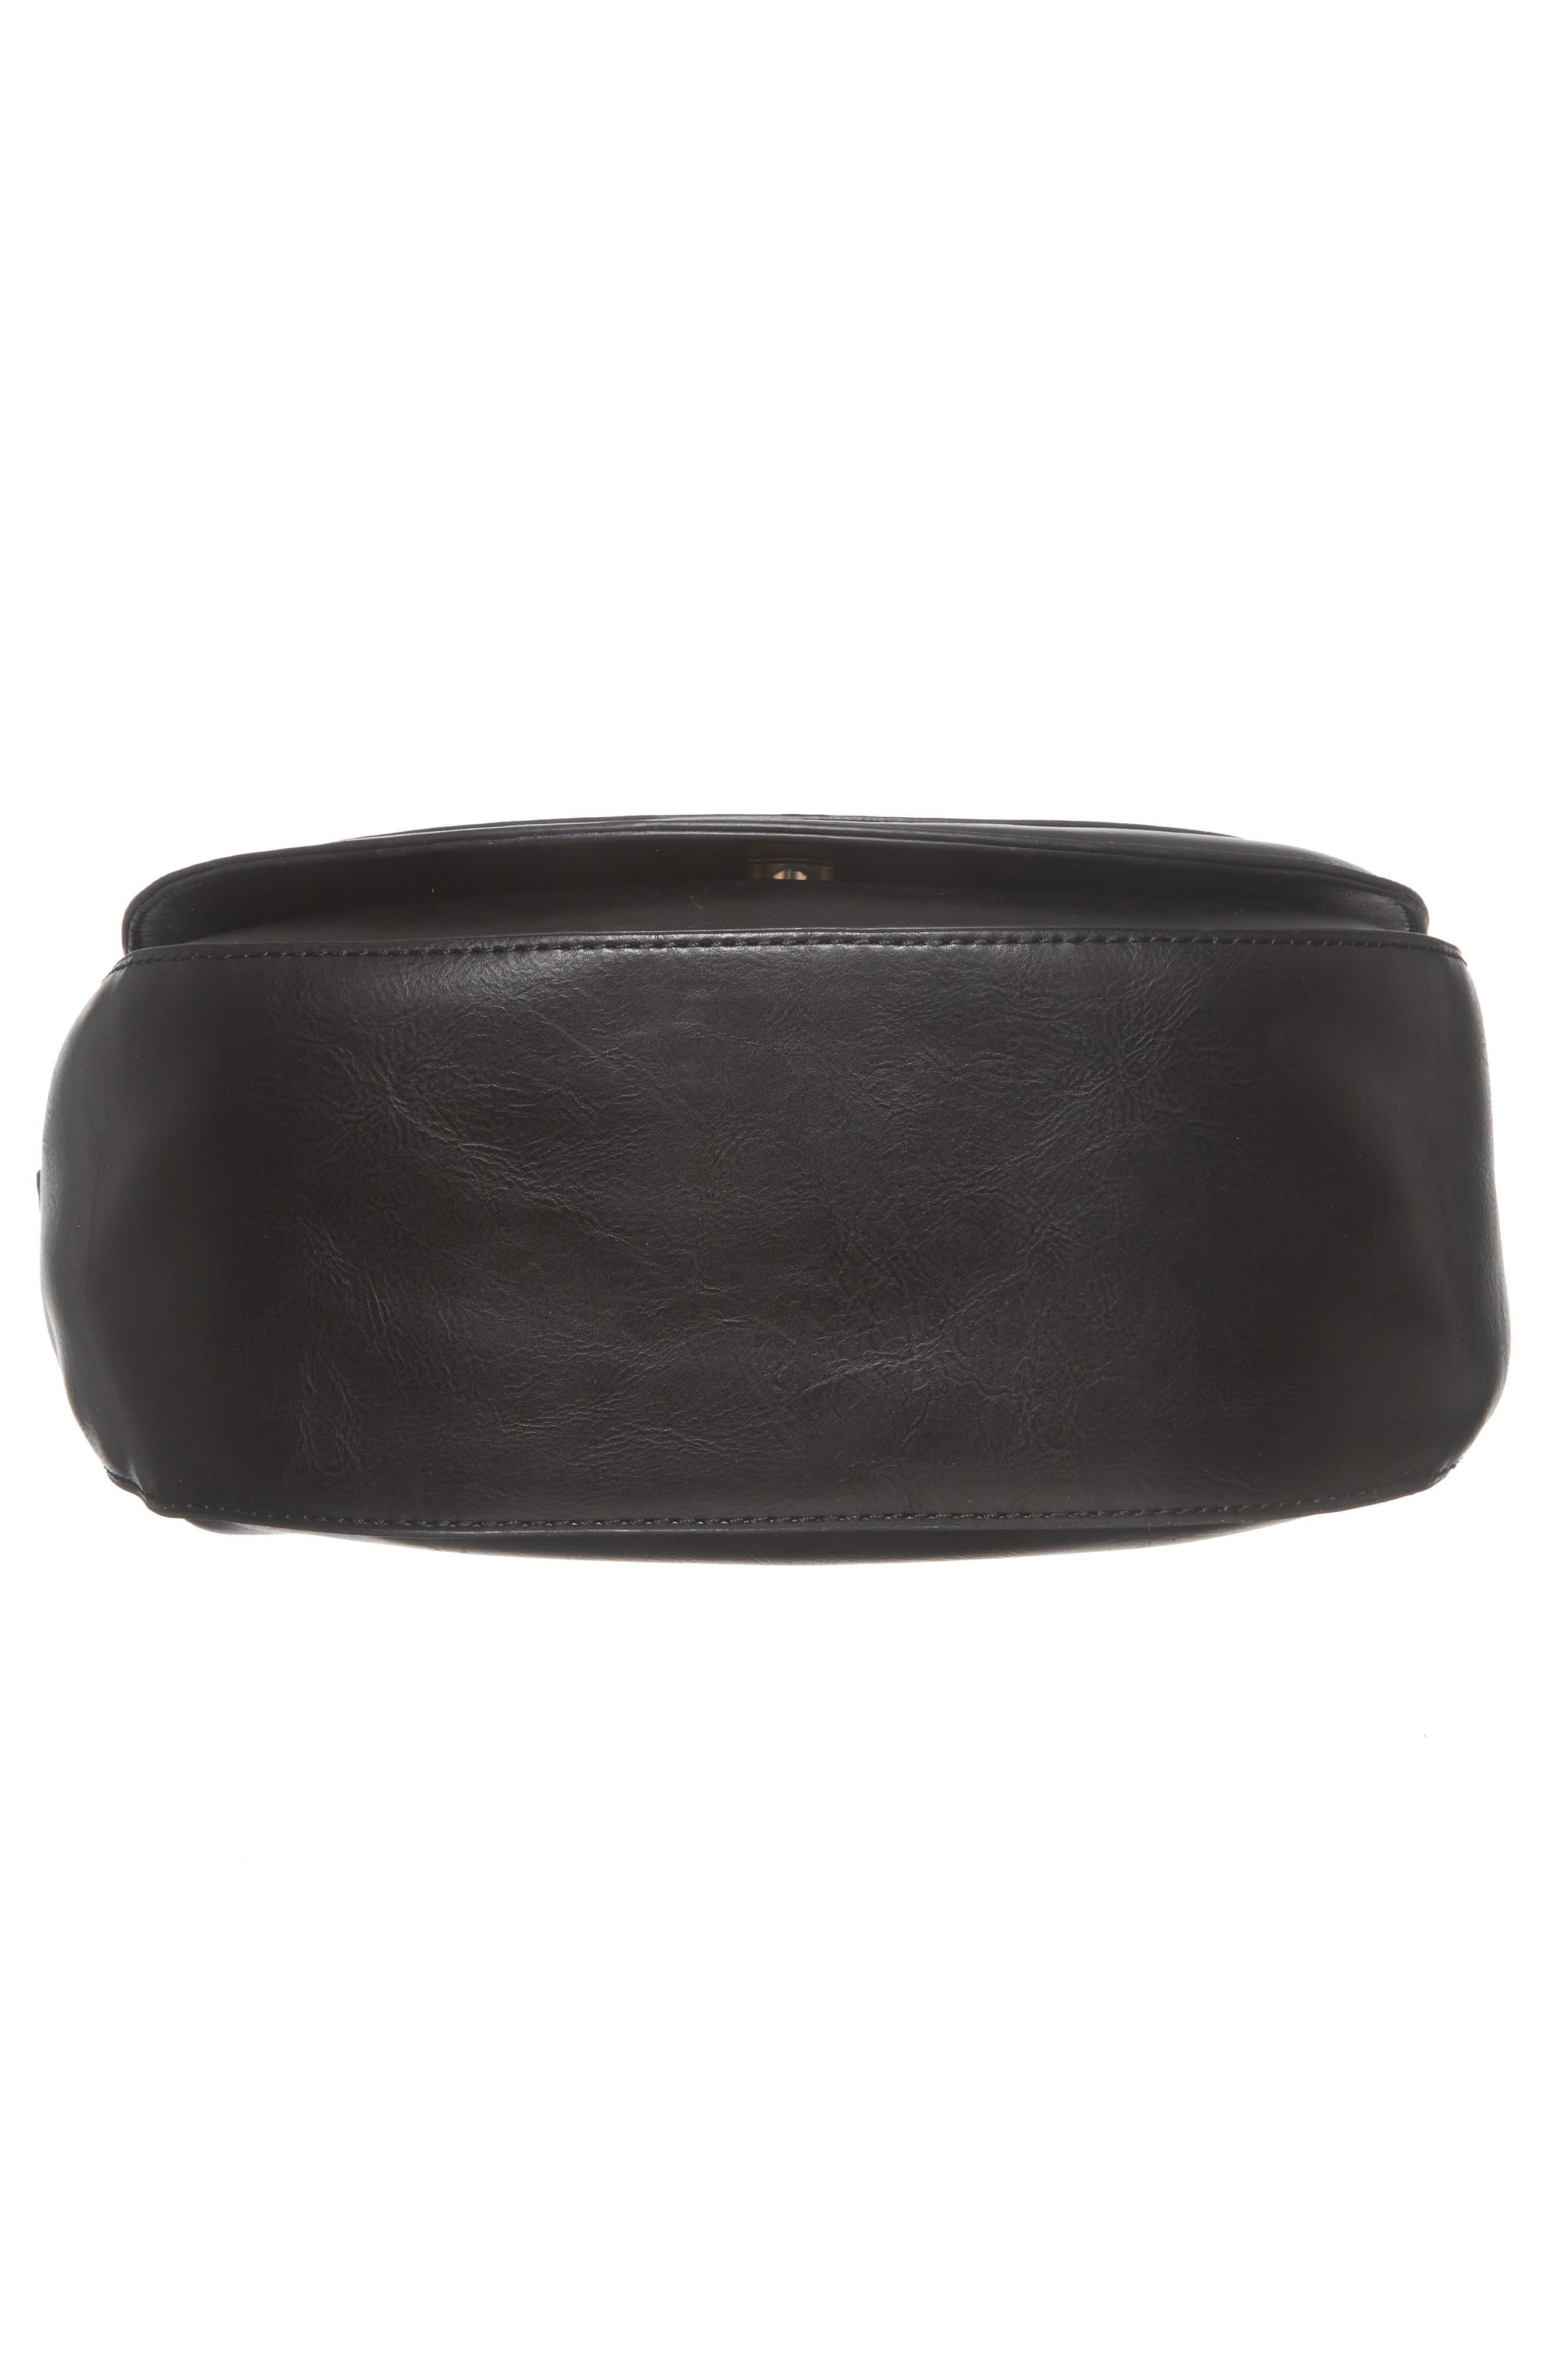 Piri Faux Leather Saddle Bag,                             Alternate thumbnail 16, color,